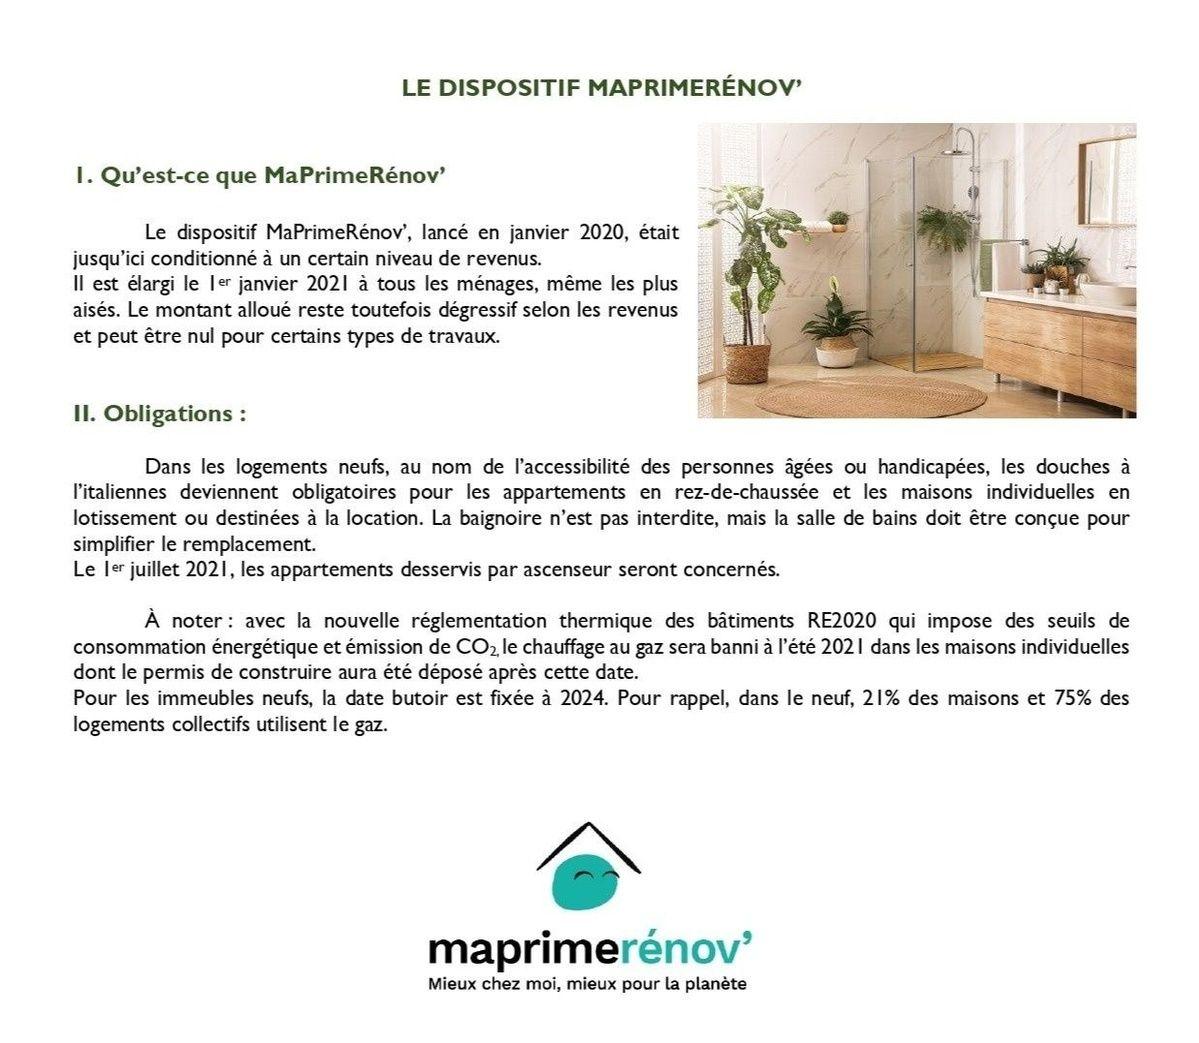 Le dispositif MaPrimeRénov'